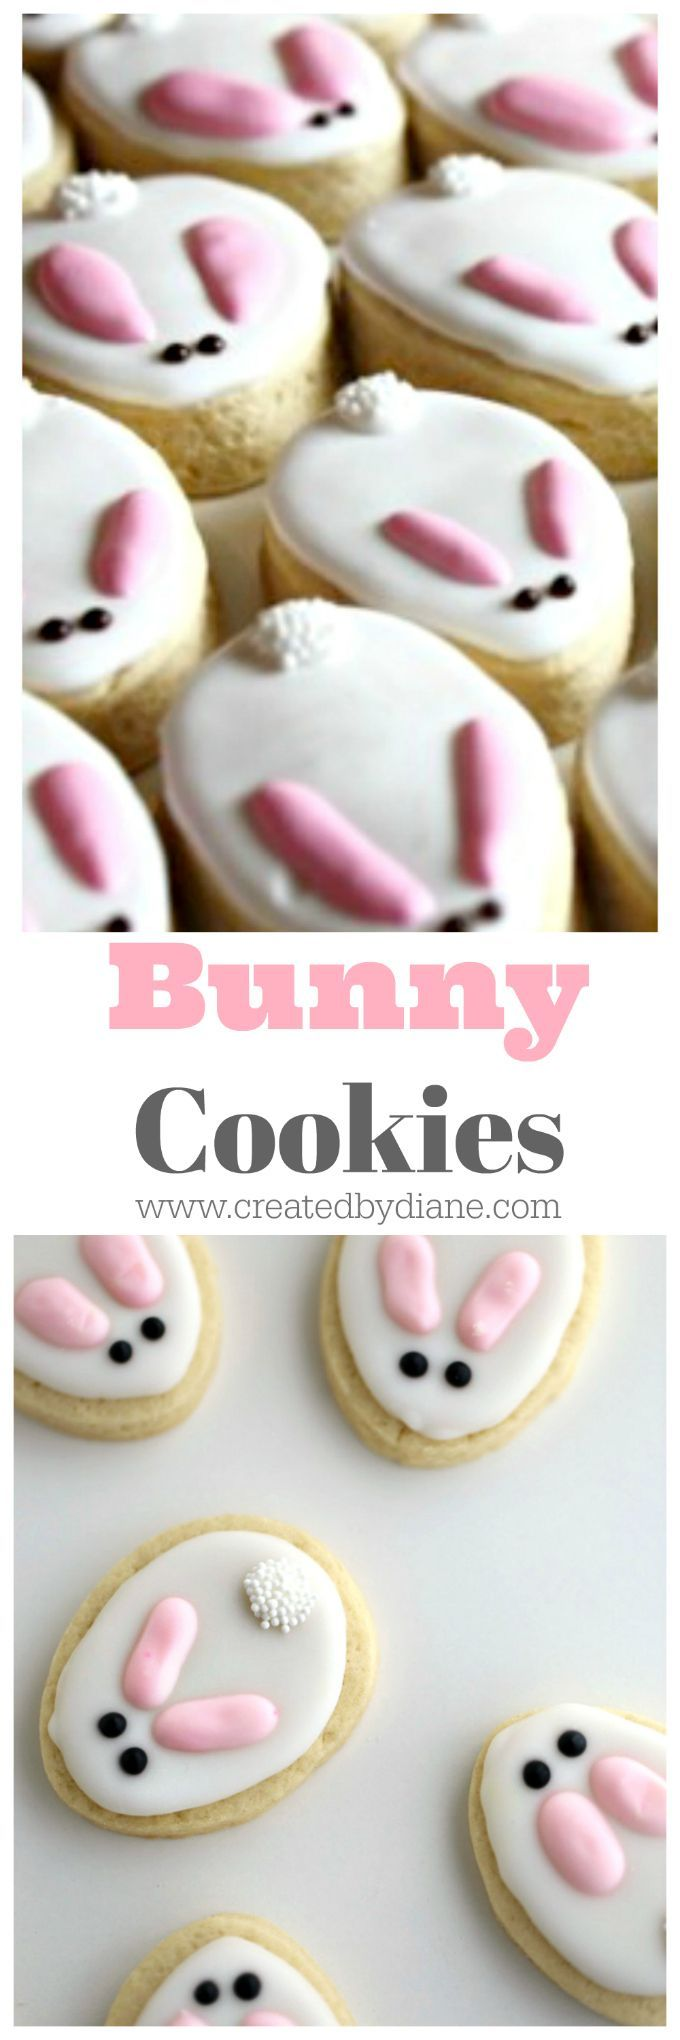 cookies decorated as bunnies easter www.createdbydiane.com